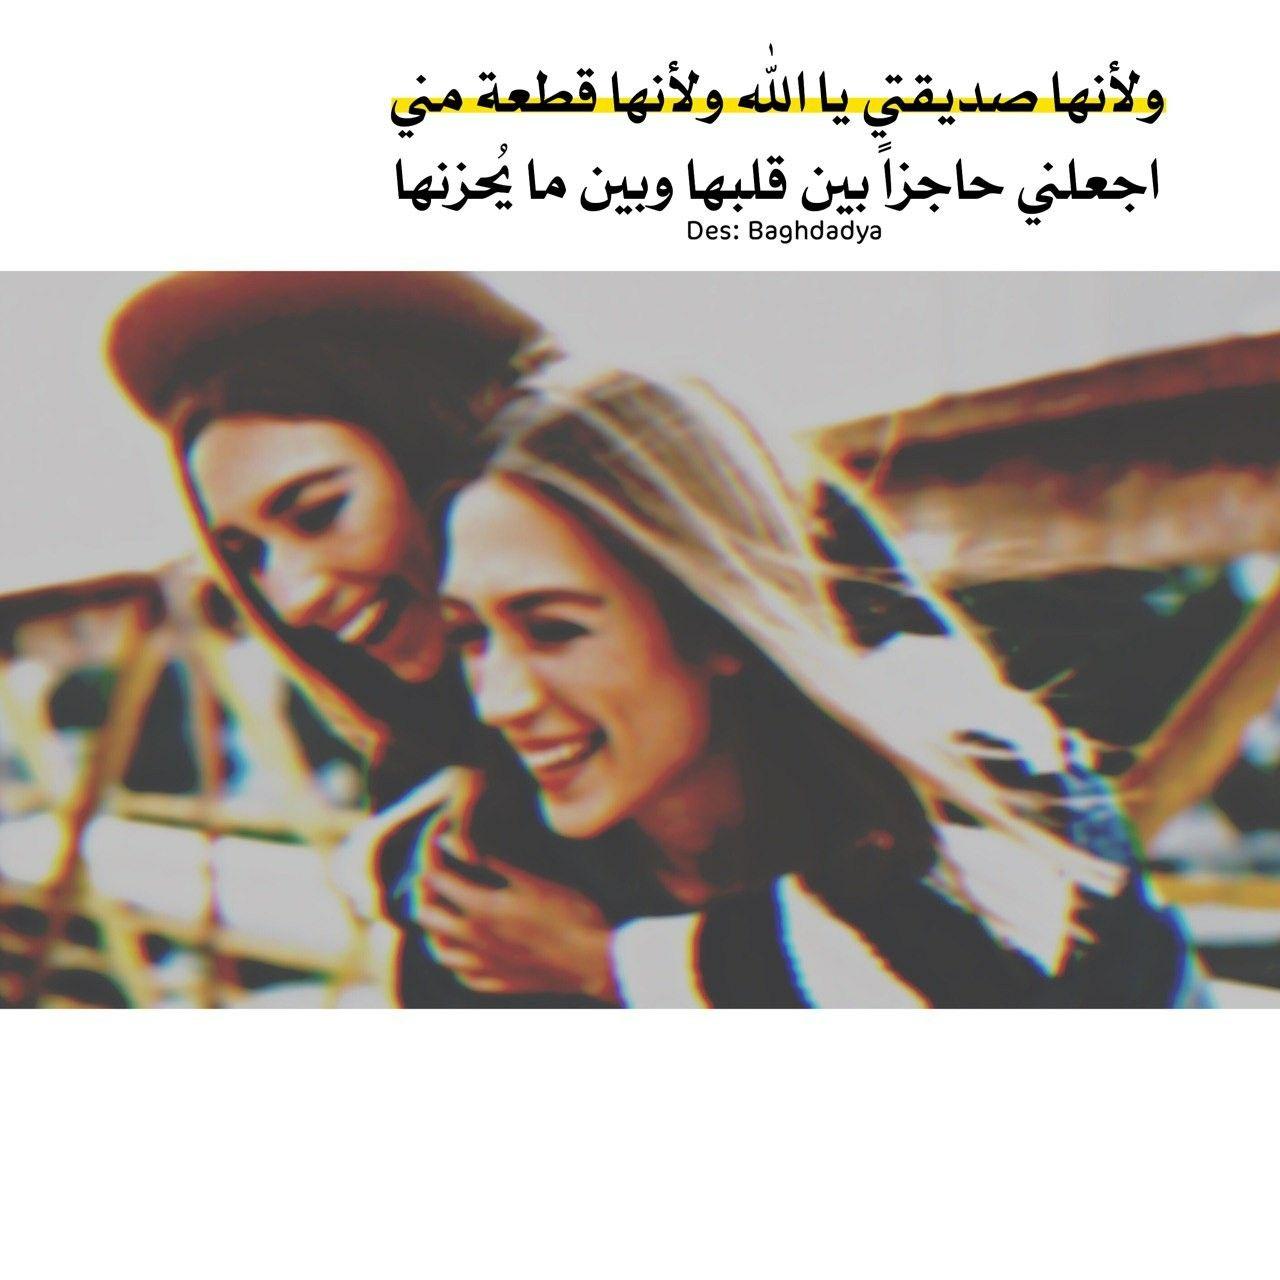 Pin By Soosoo Abdoo On رمزيات Arabic Quotes Qoutes Love Quotes